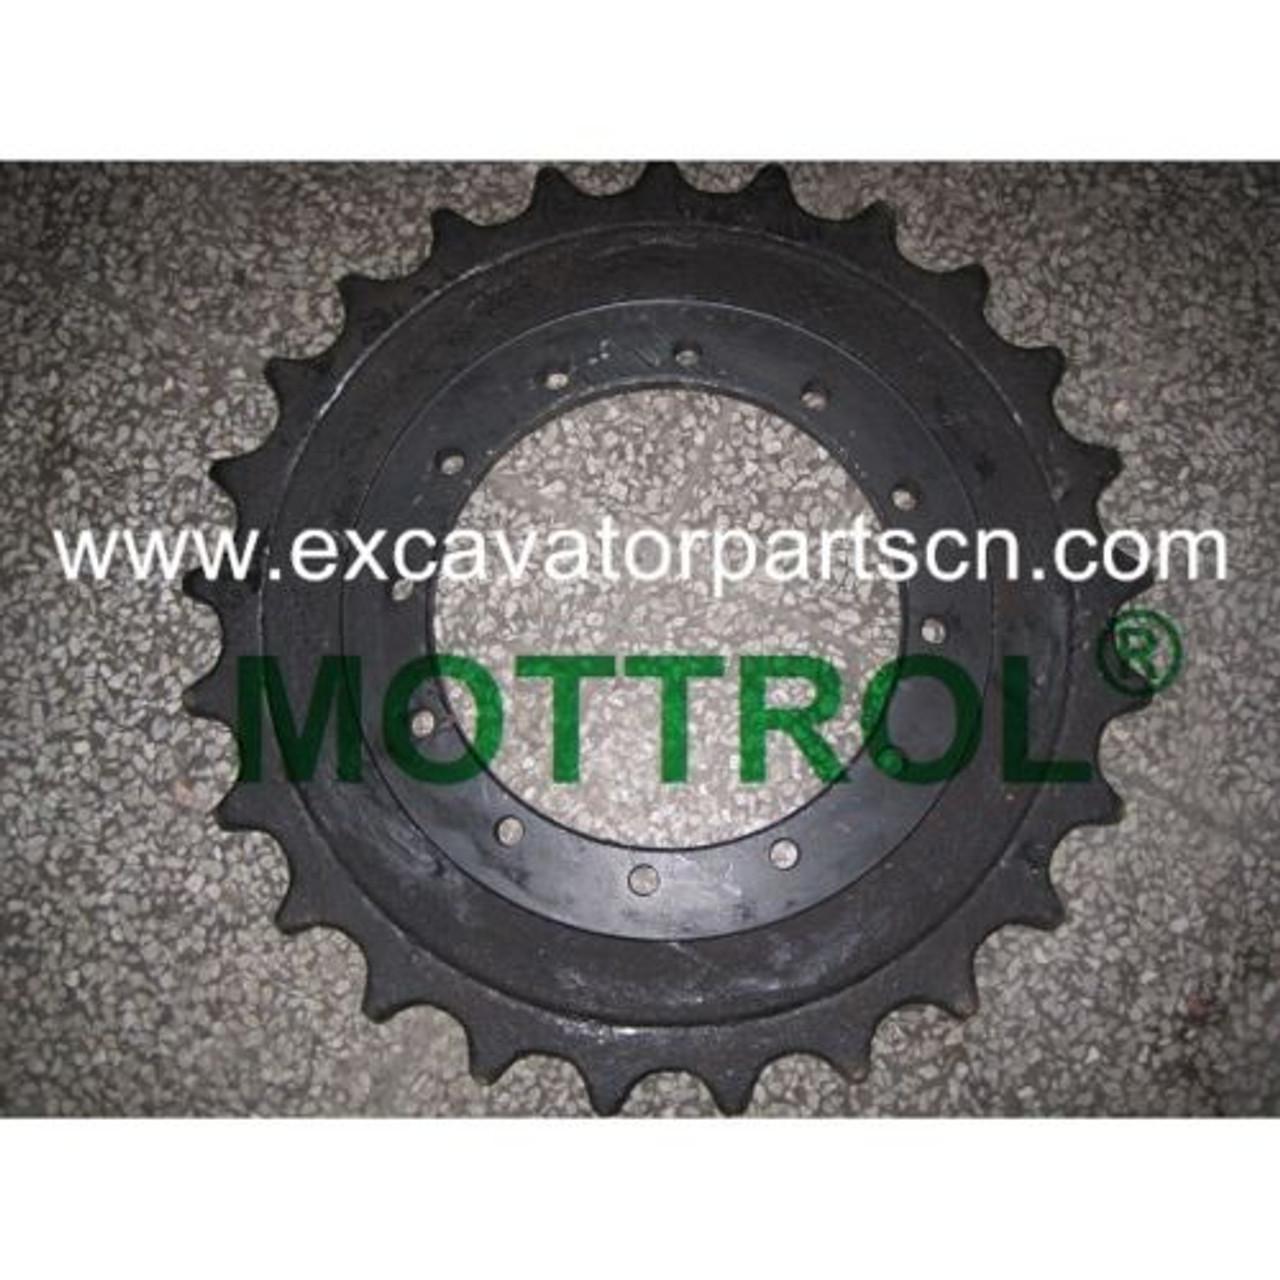 SPROCKET ASSY-EX120-FH120-FH130 AT180462 AT316098 1010325  TH108826